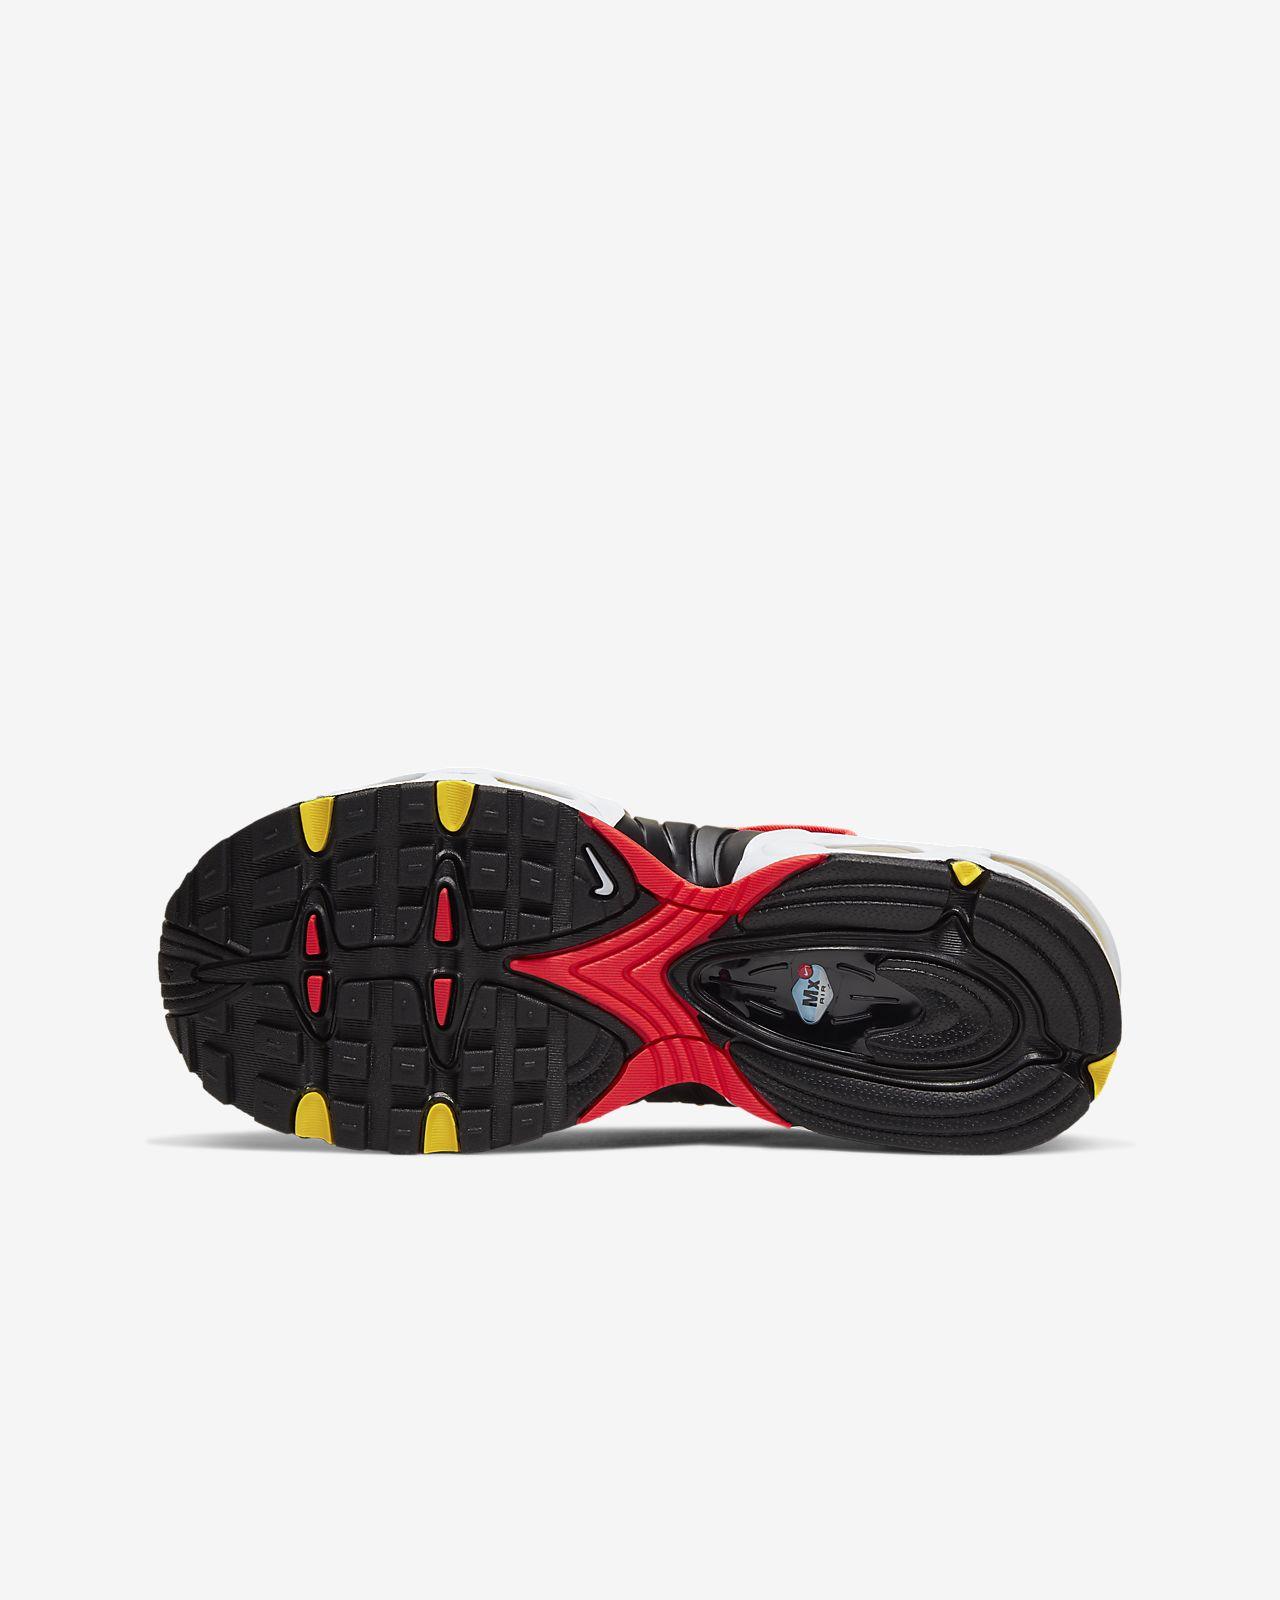 Nike Air Max Tailwind IV Schuh für ältere Kinder